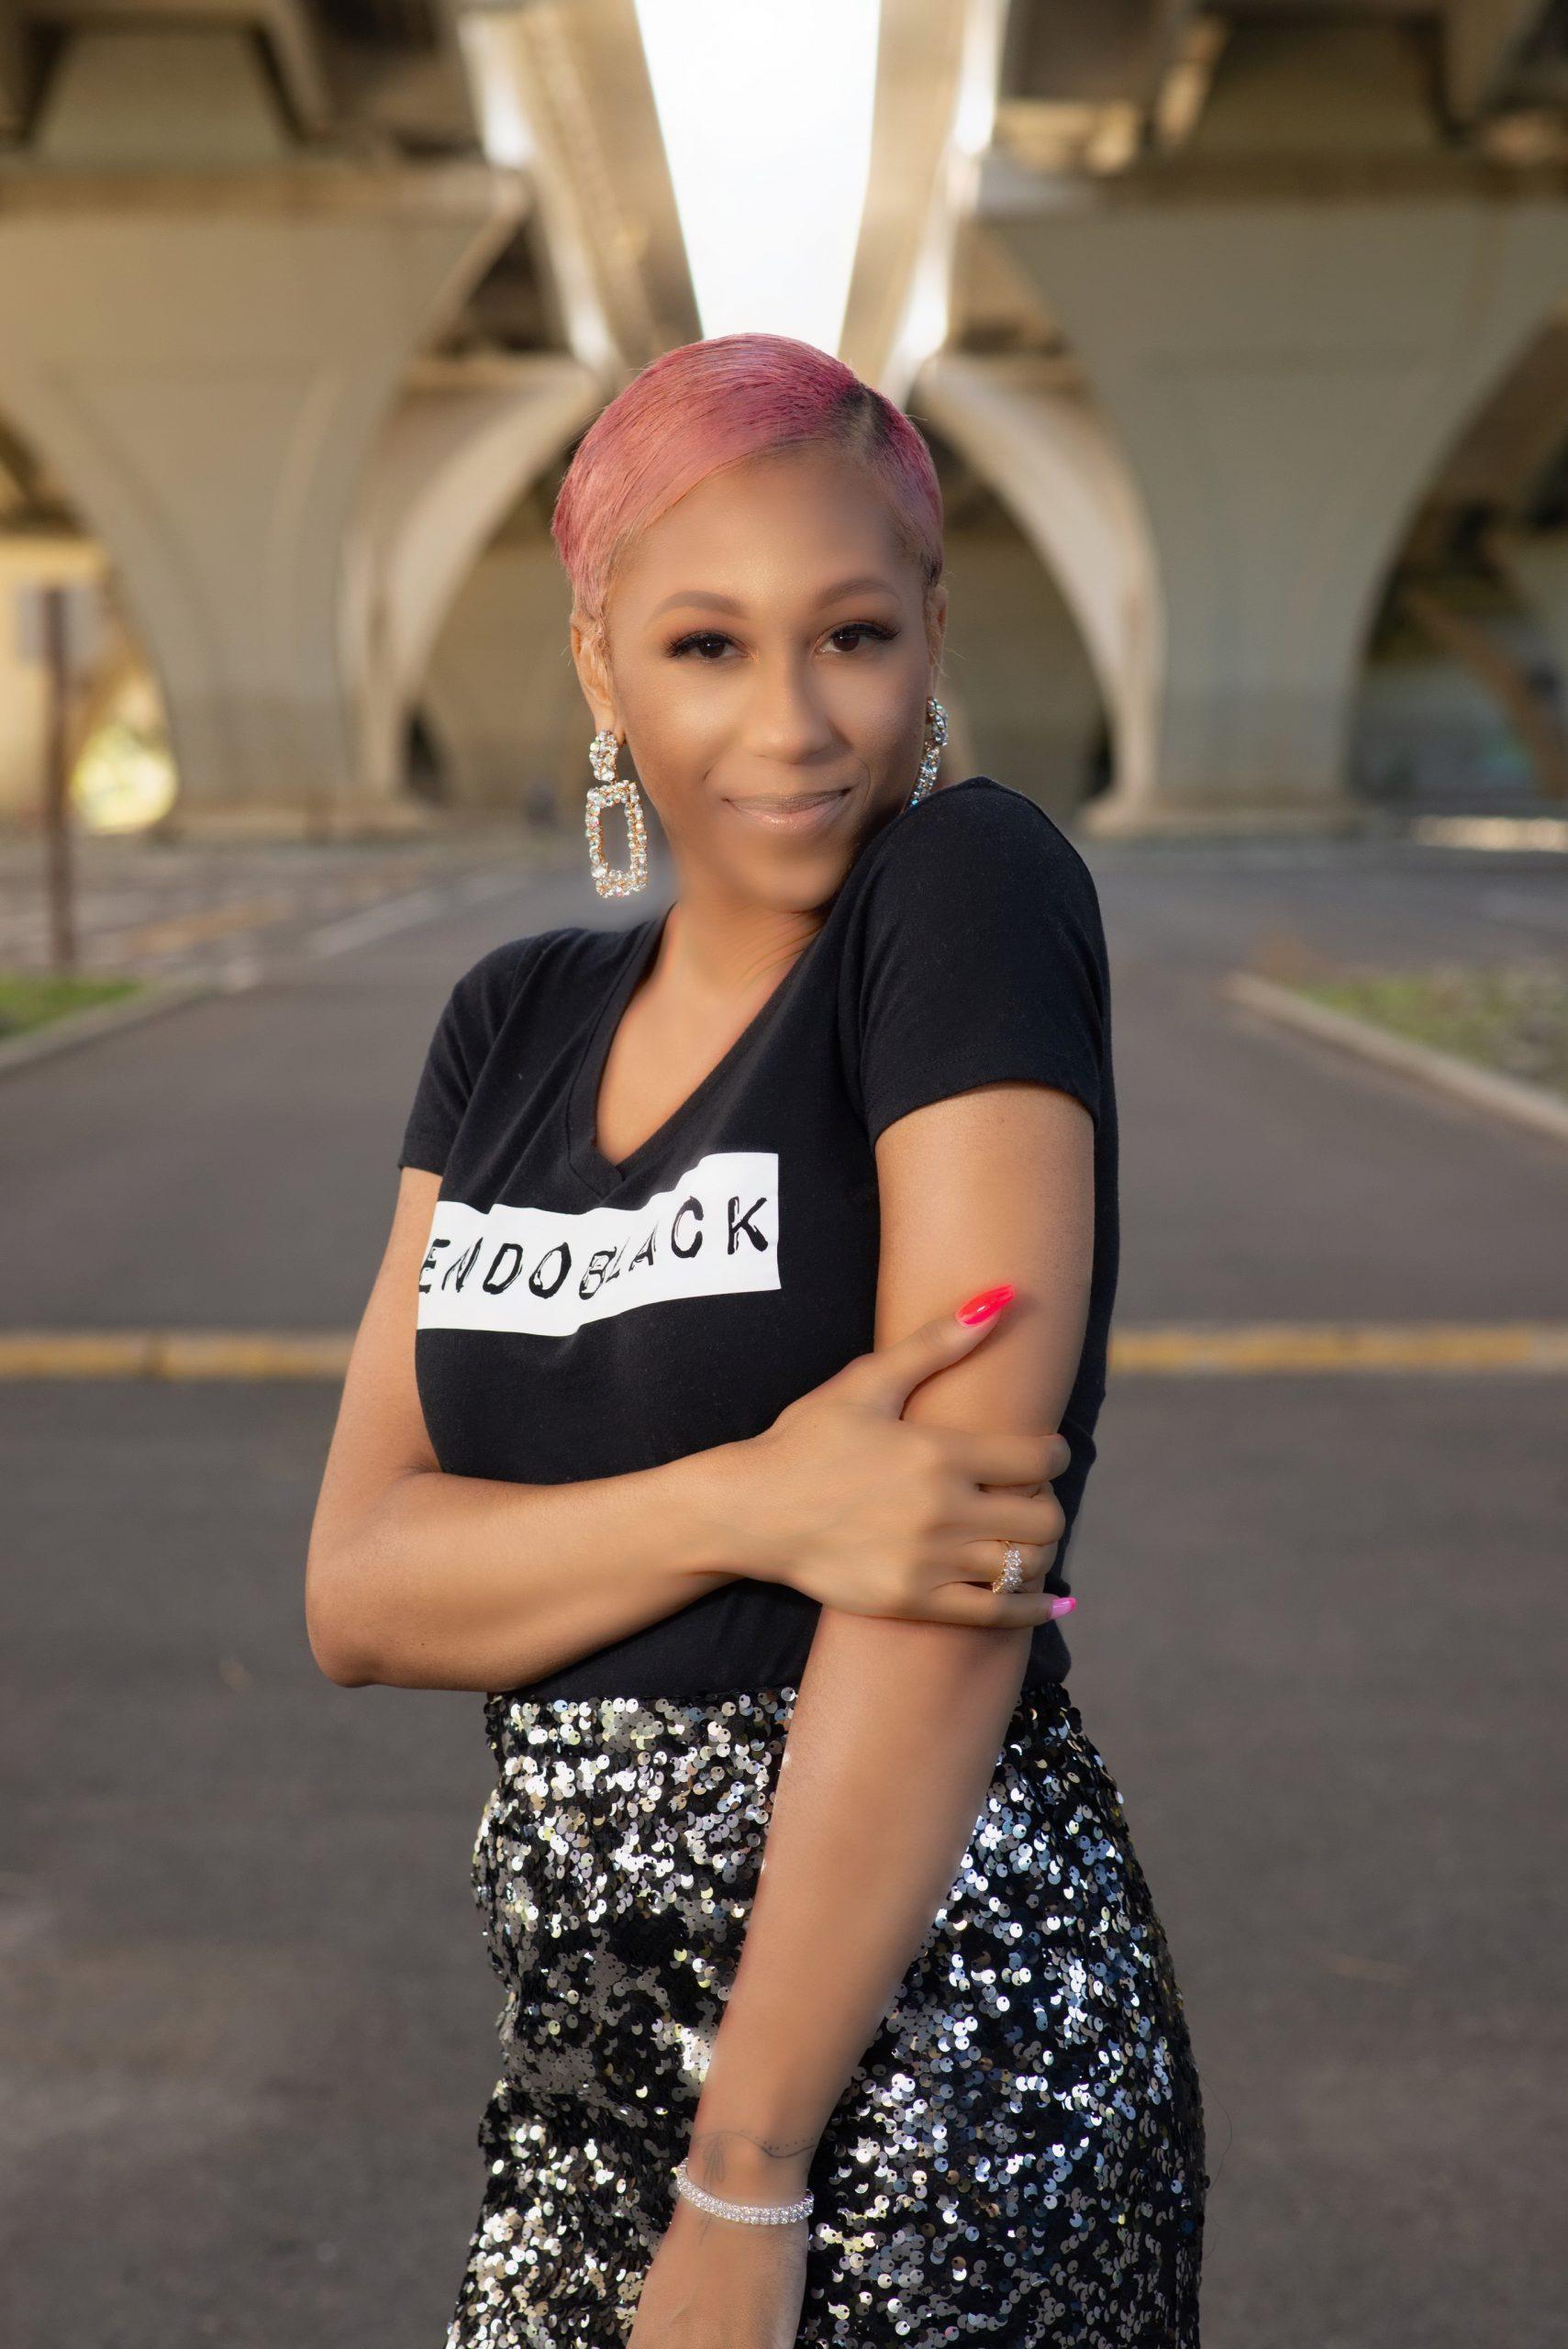 ENDO Black Lauren Kornegay Uninvisible Pod endometriosis